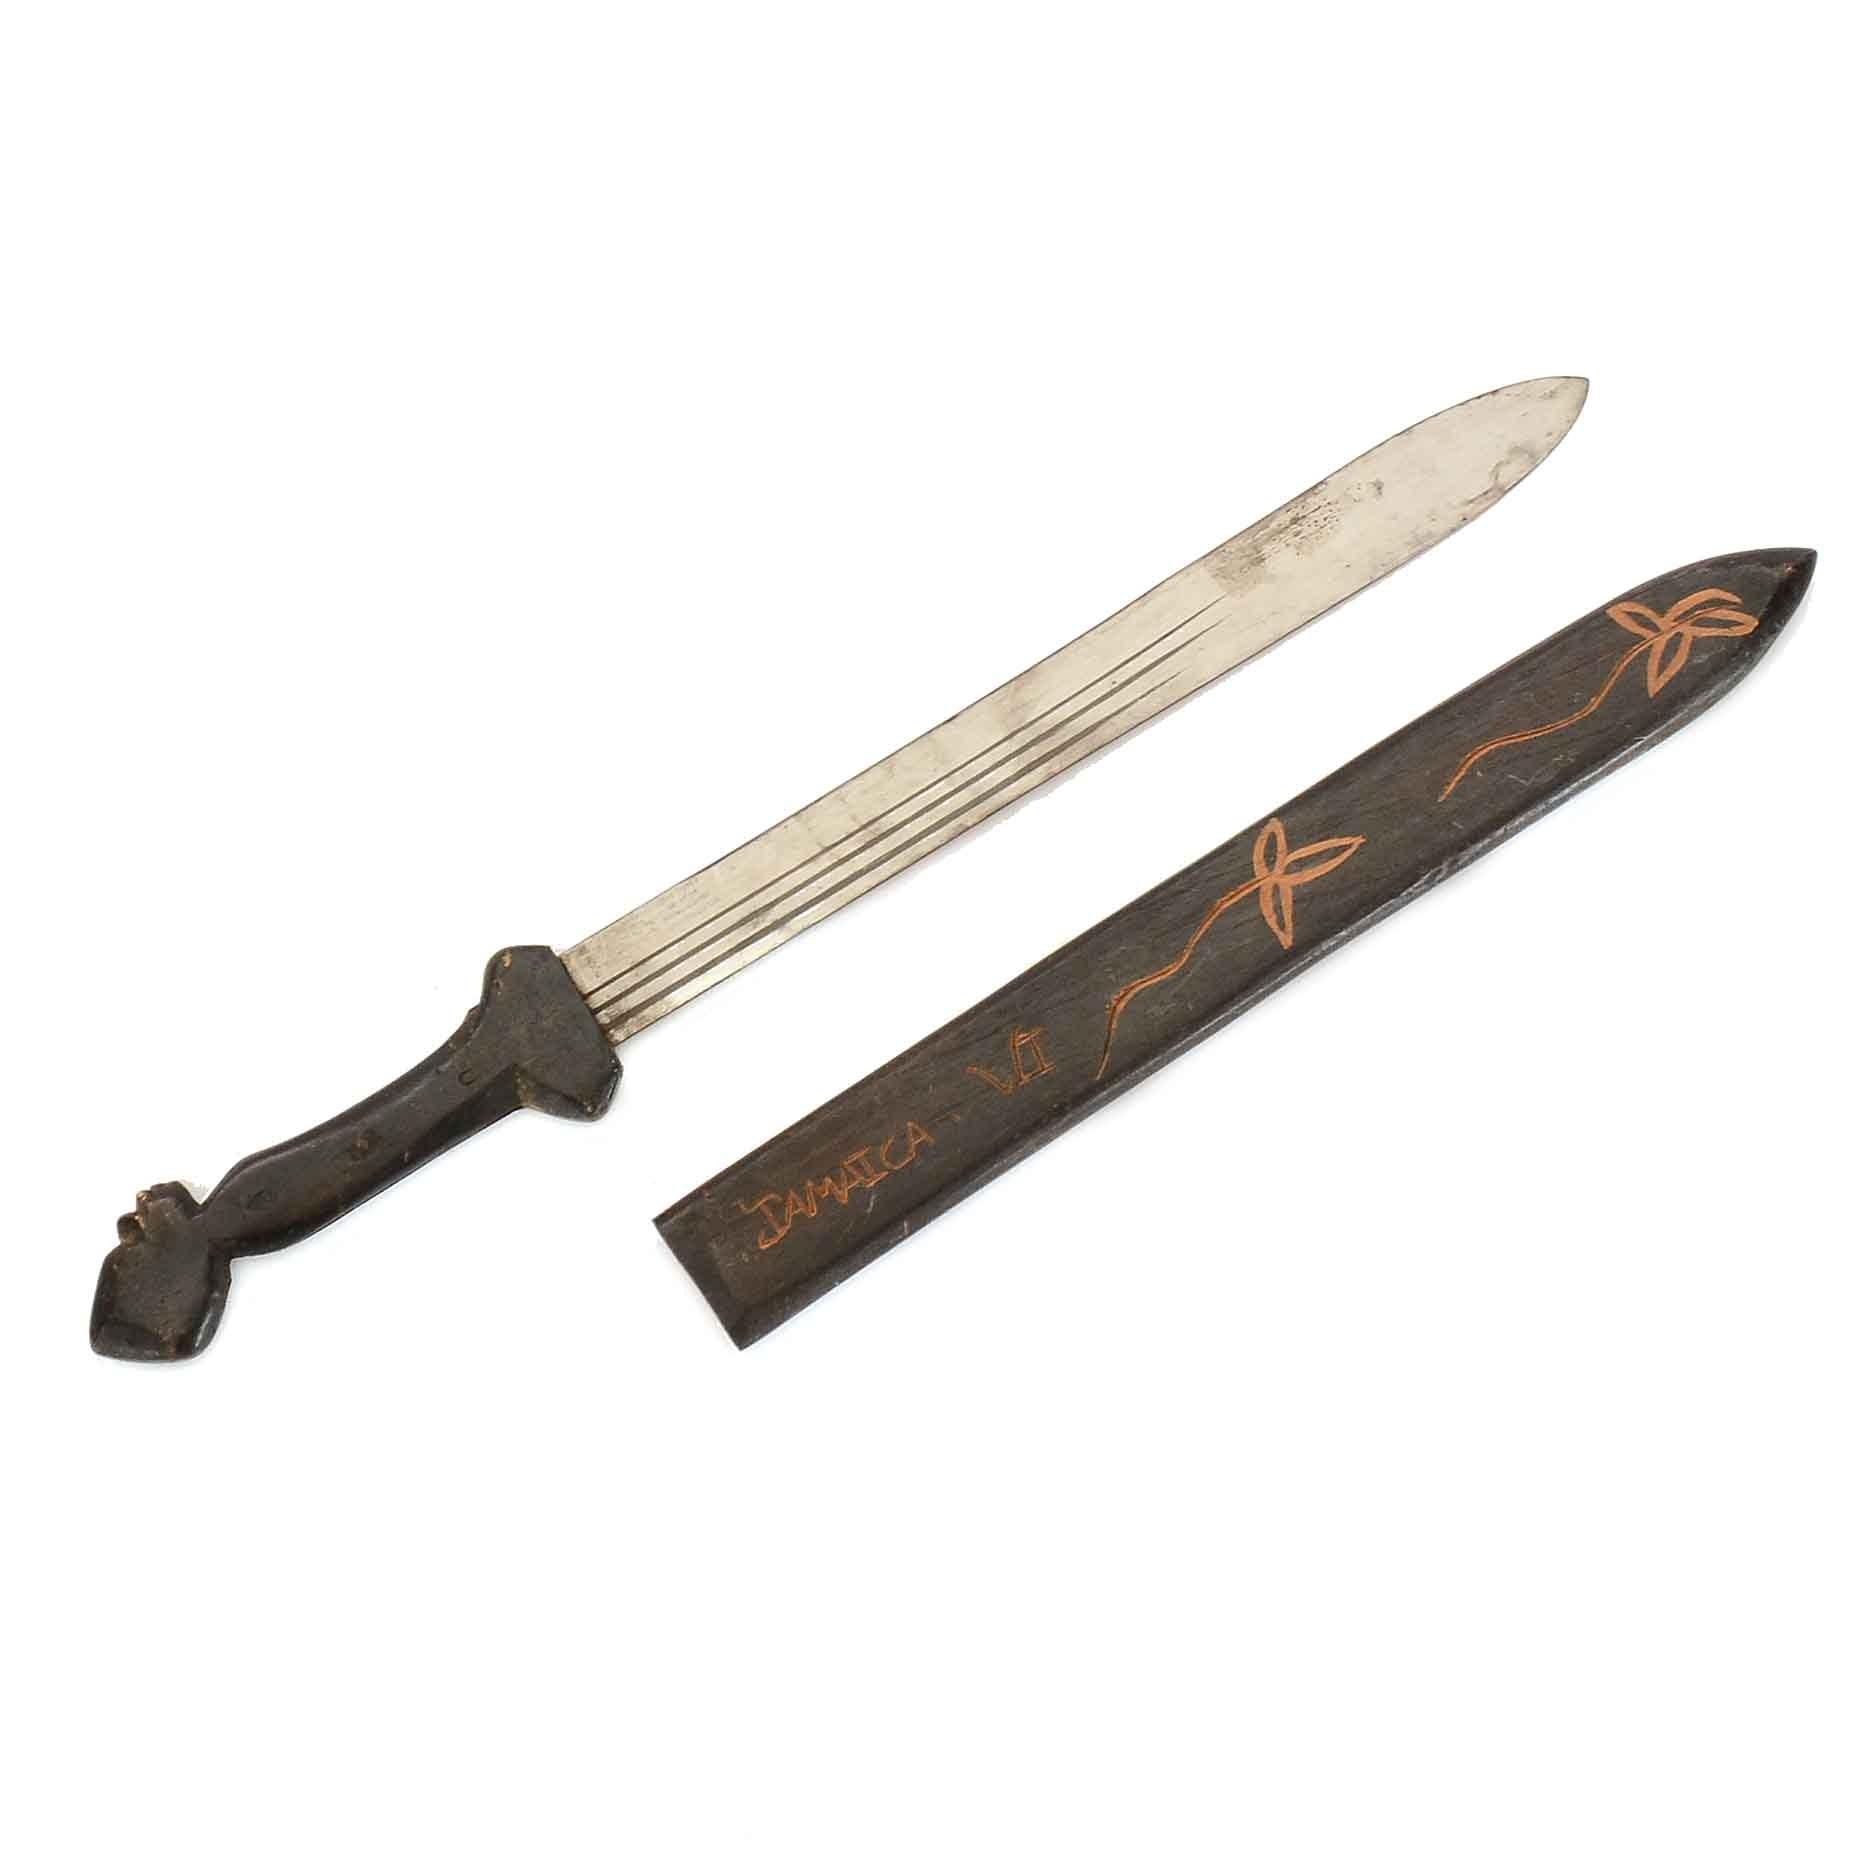 Replica Gladius Style Sword with Wooden Sleeve